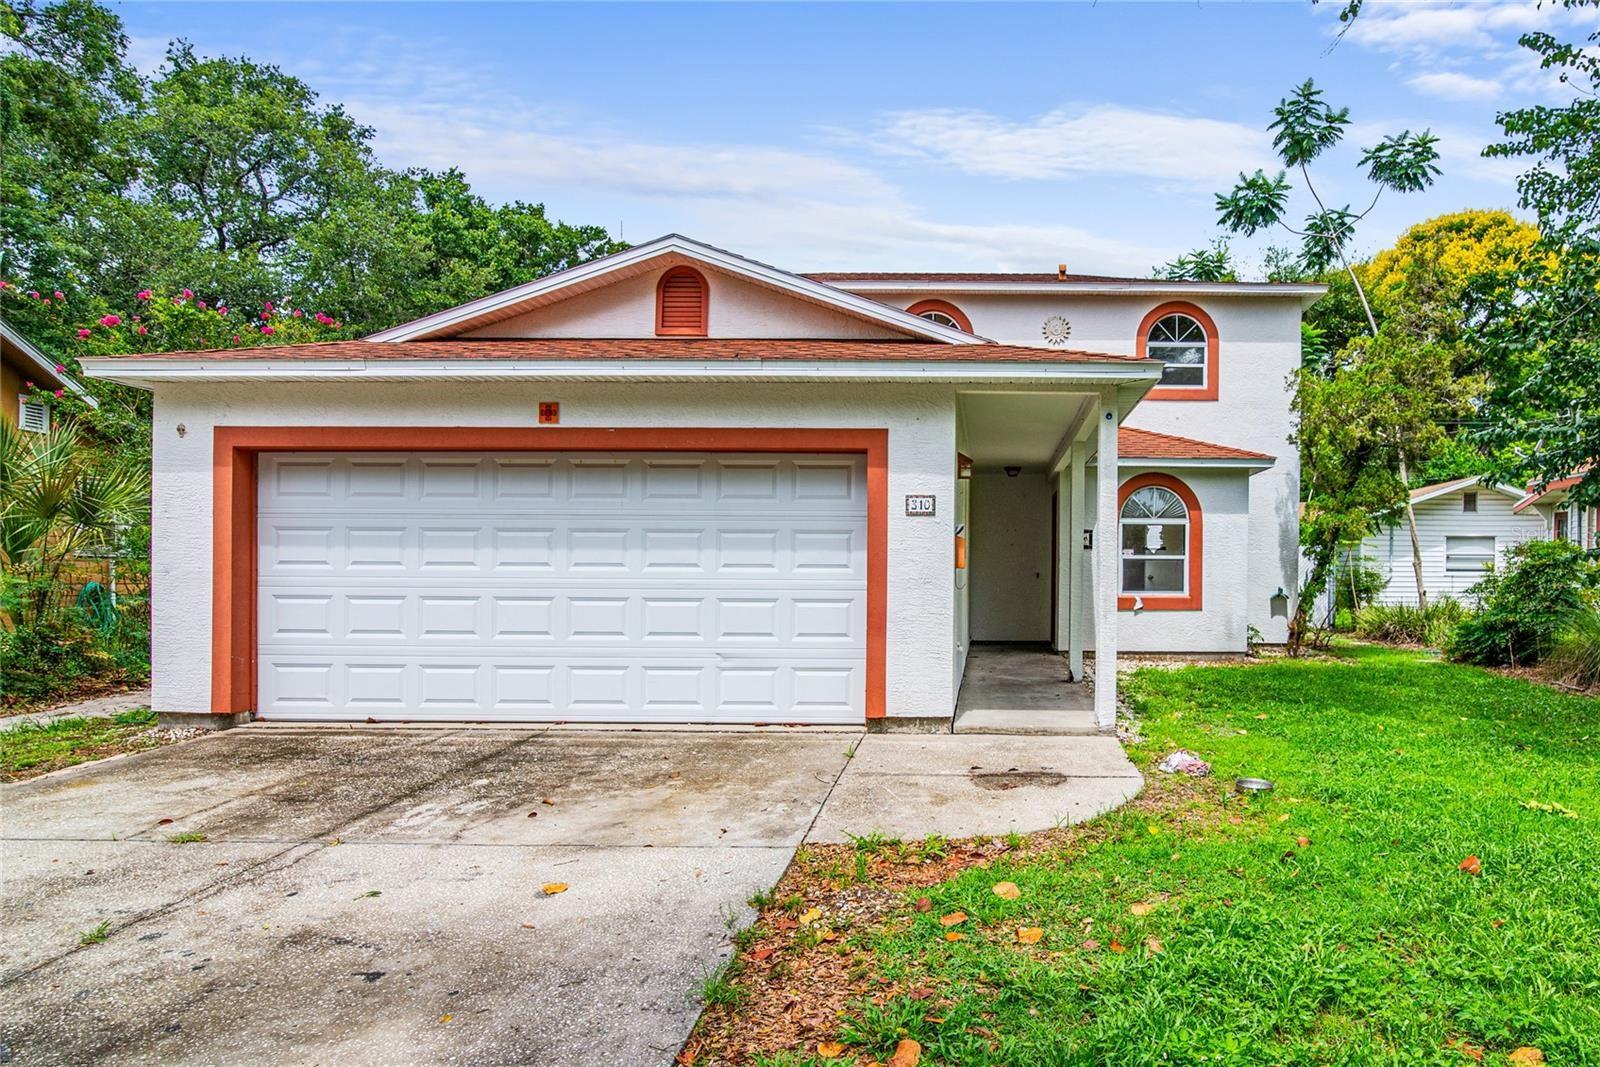 310 S BOYD STREET, Winter Garden, FL 34787 - #: O5956470